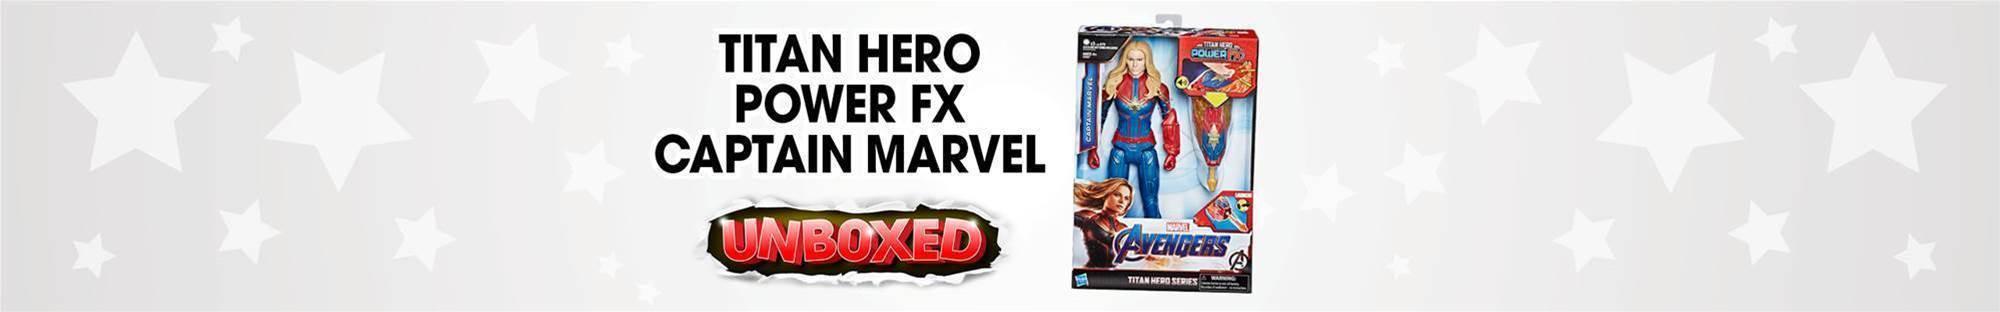 Captain Marvel Titan Hero Unboxing